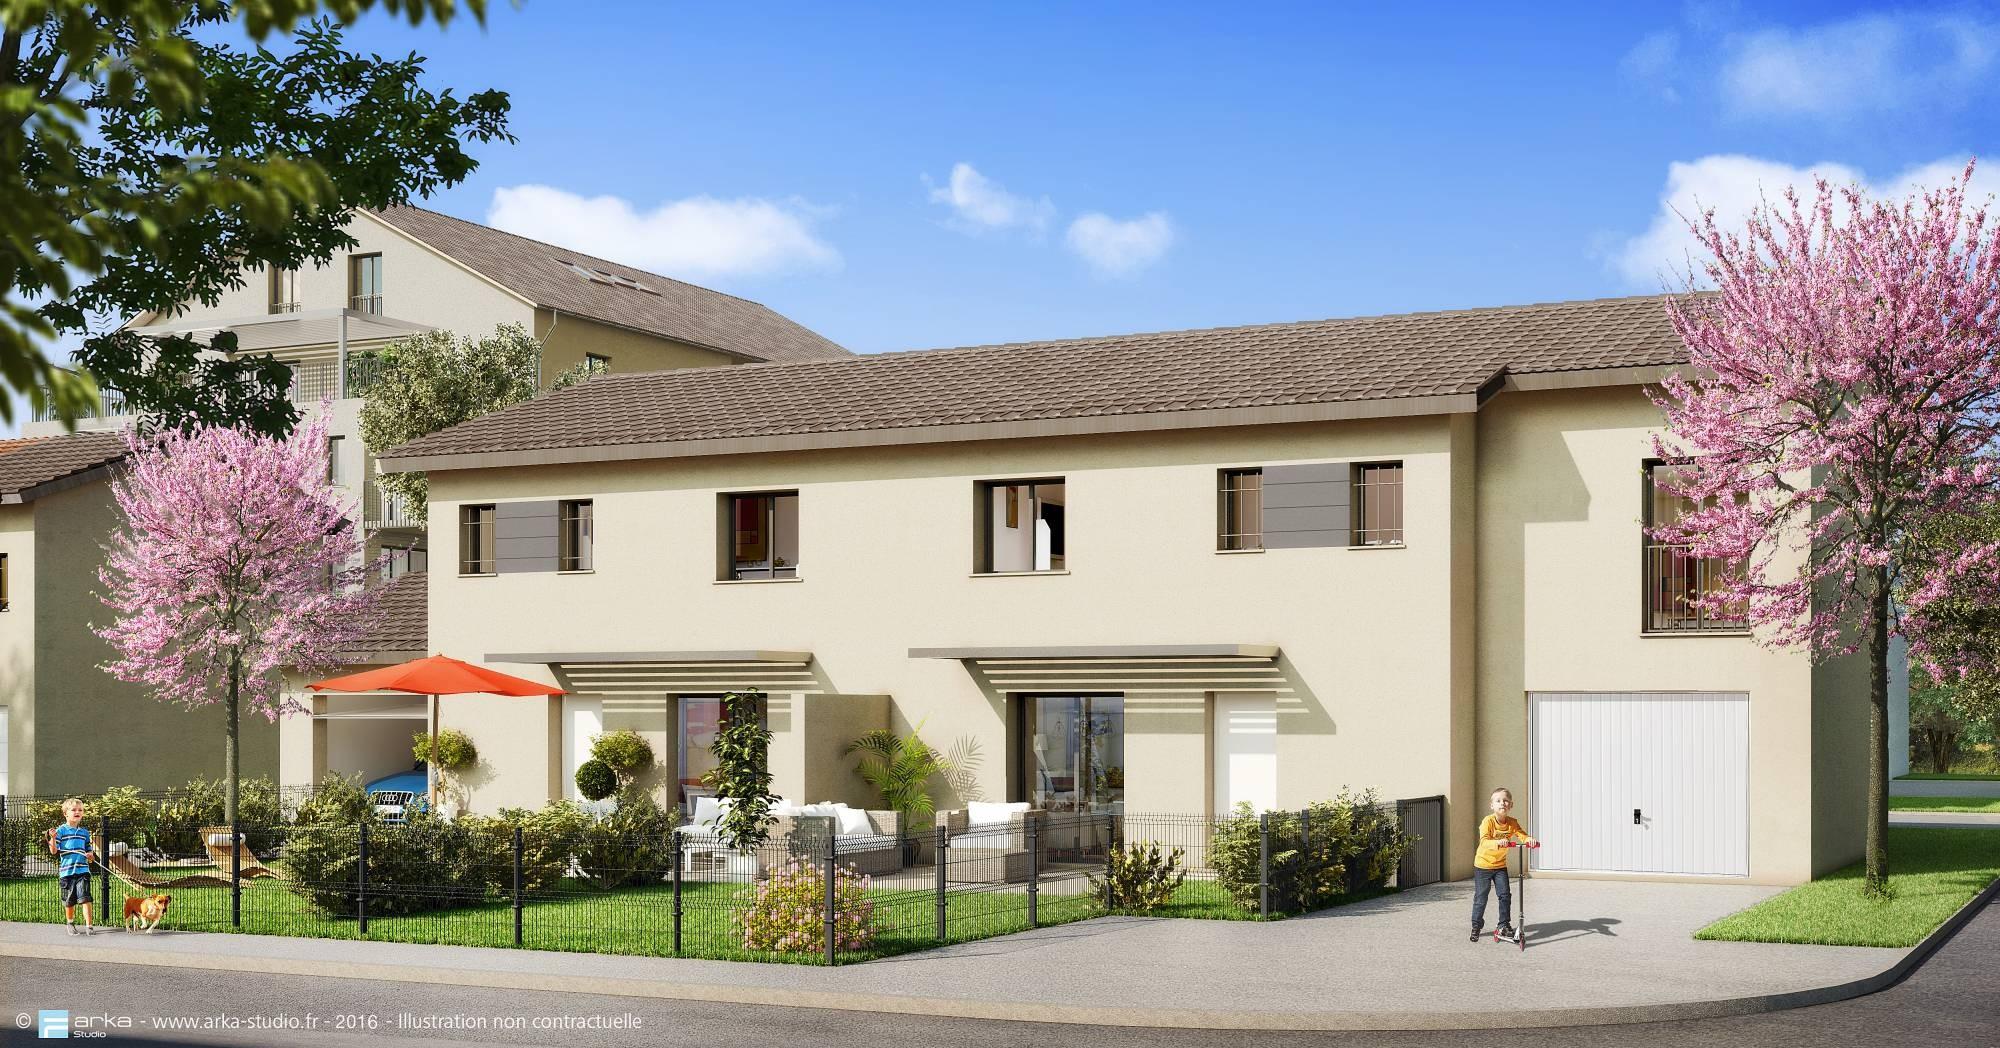 Jardin Zen Amberieu Impressionnant Photos Construire Ou Acheter Une Maison Iamzoewatson Iamzoewatson